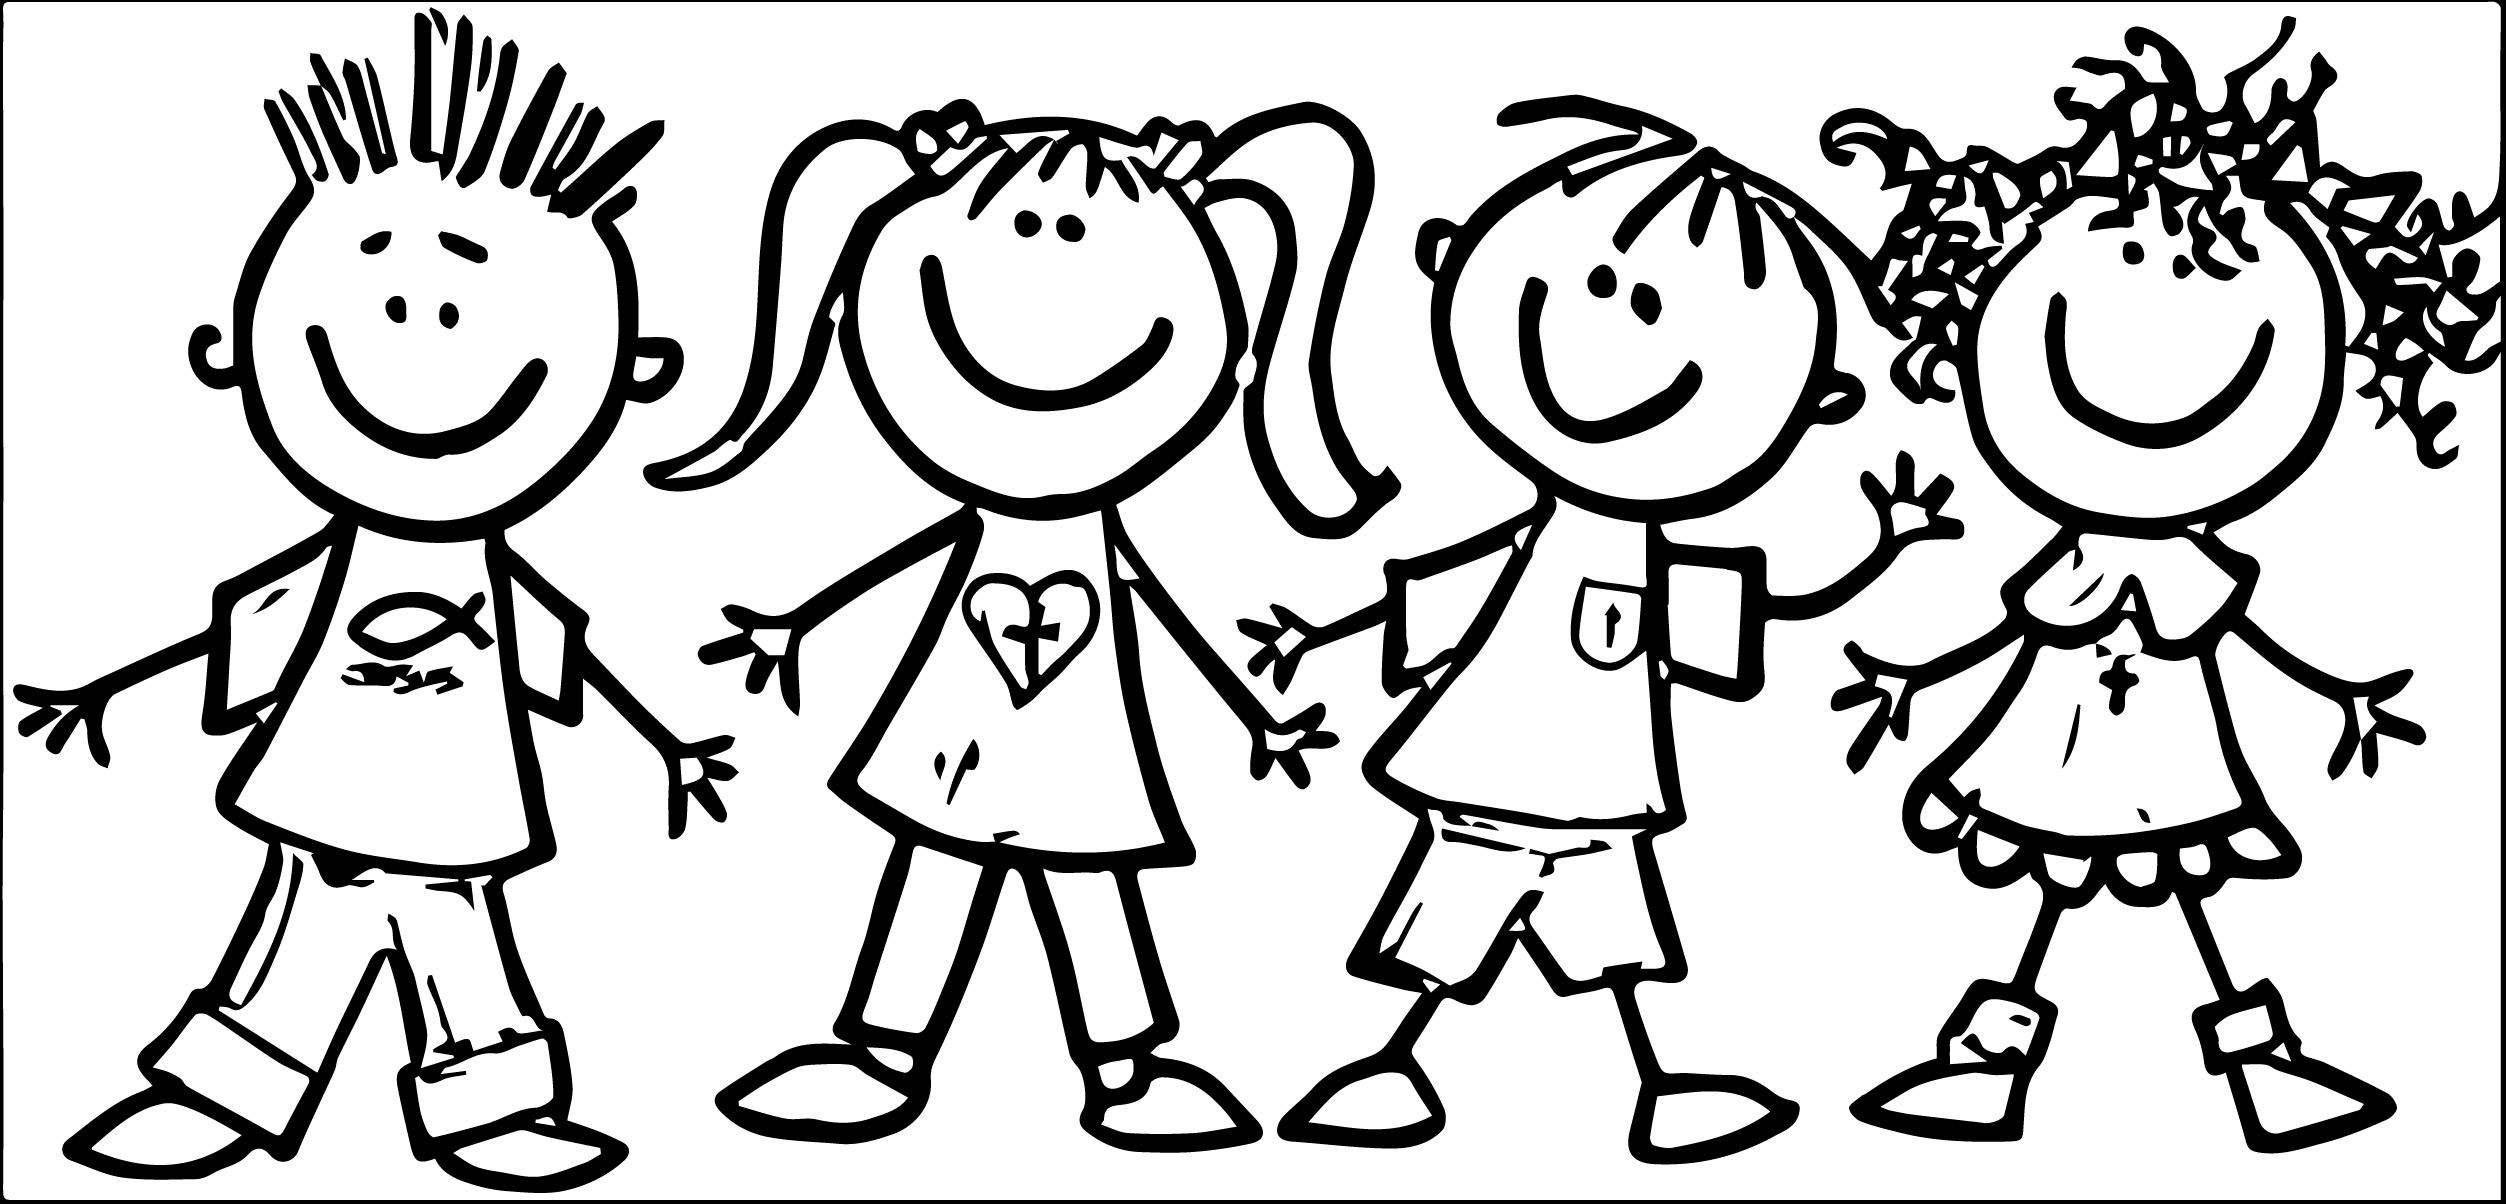 Preschool clip art kids we coloring page wecoloringpage